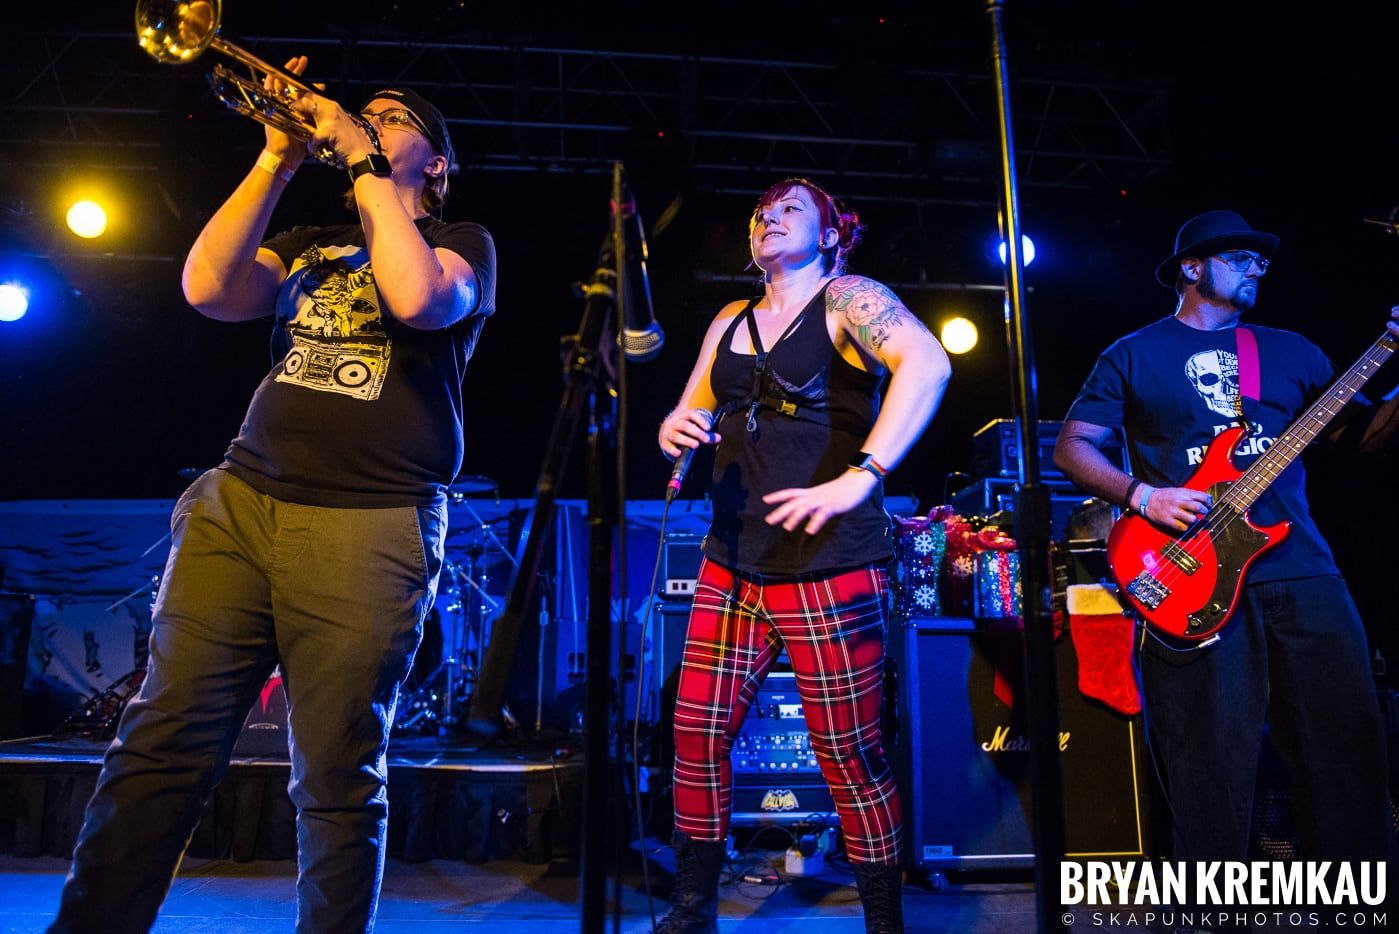 Backyard Superheroes @ Starland Ballroom, Sayreville, NJ - 11.23.18 (19)